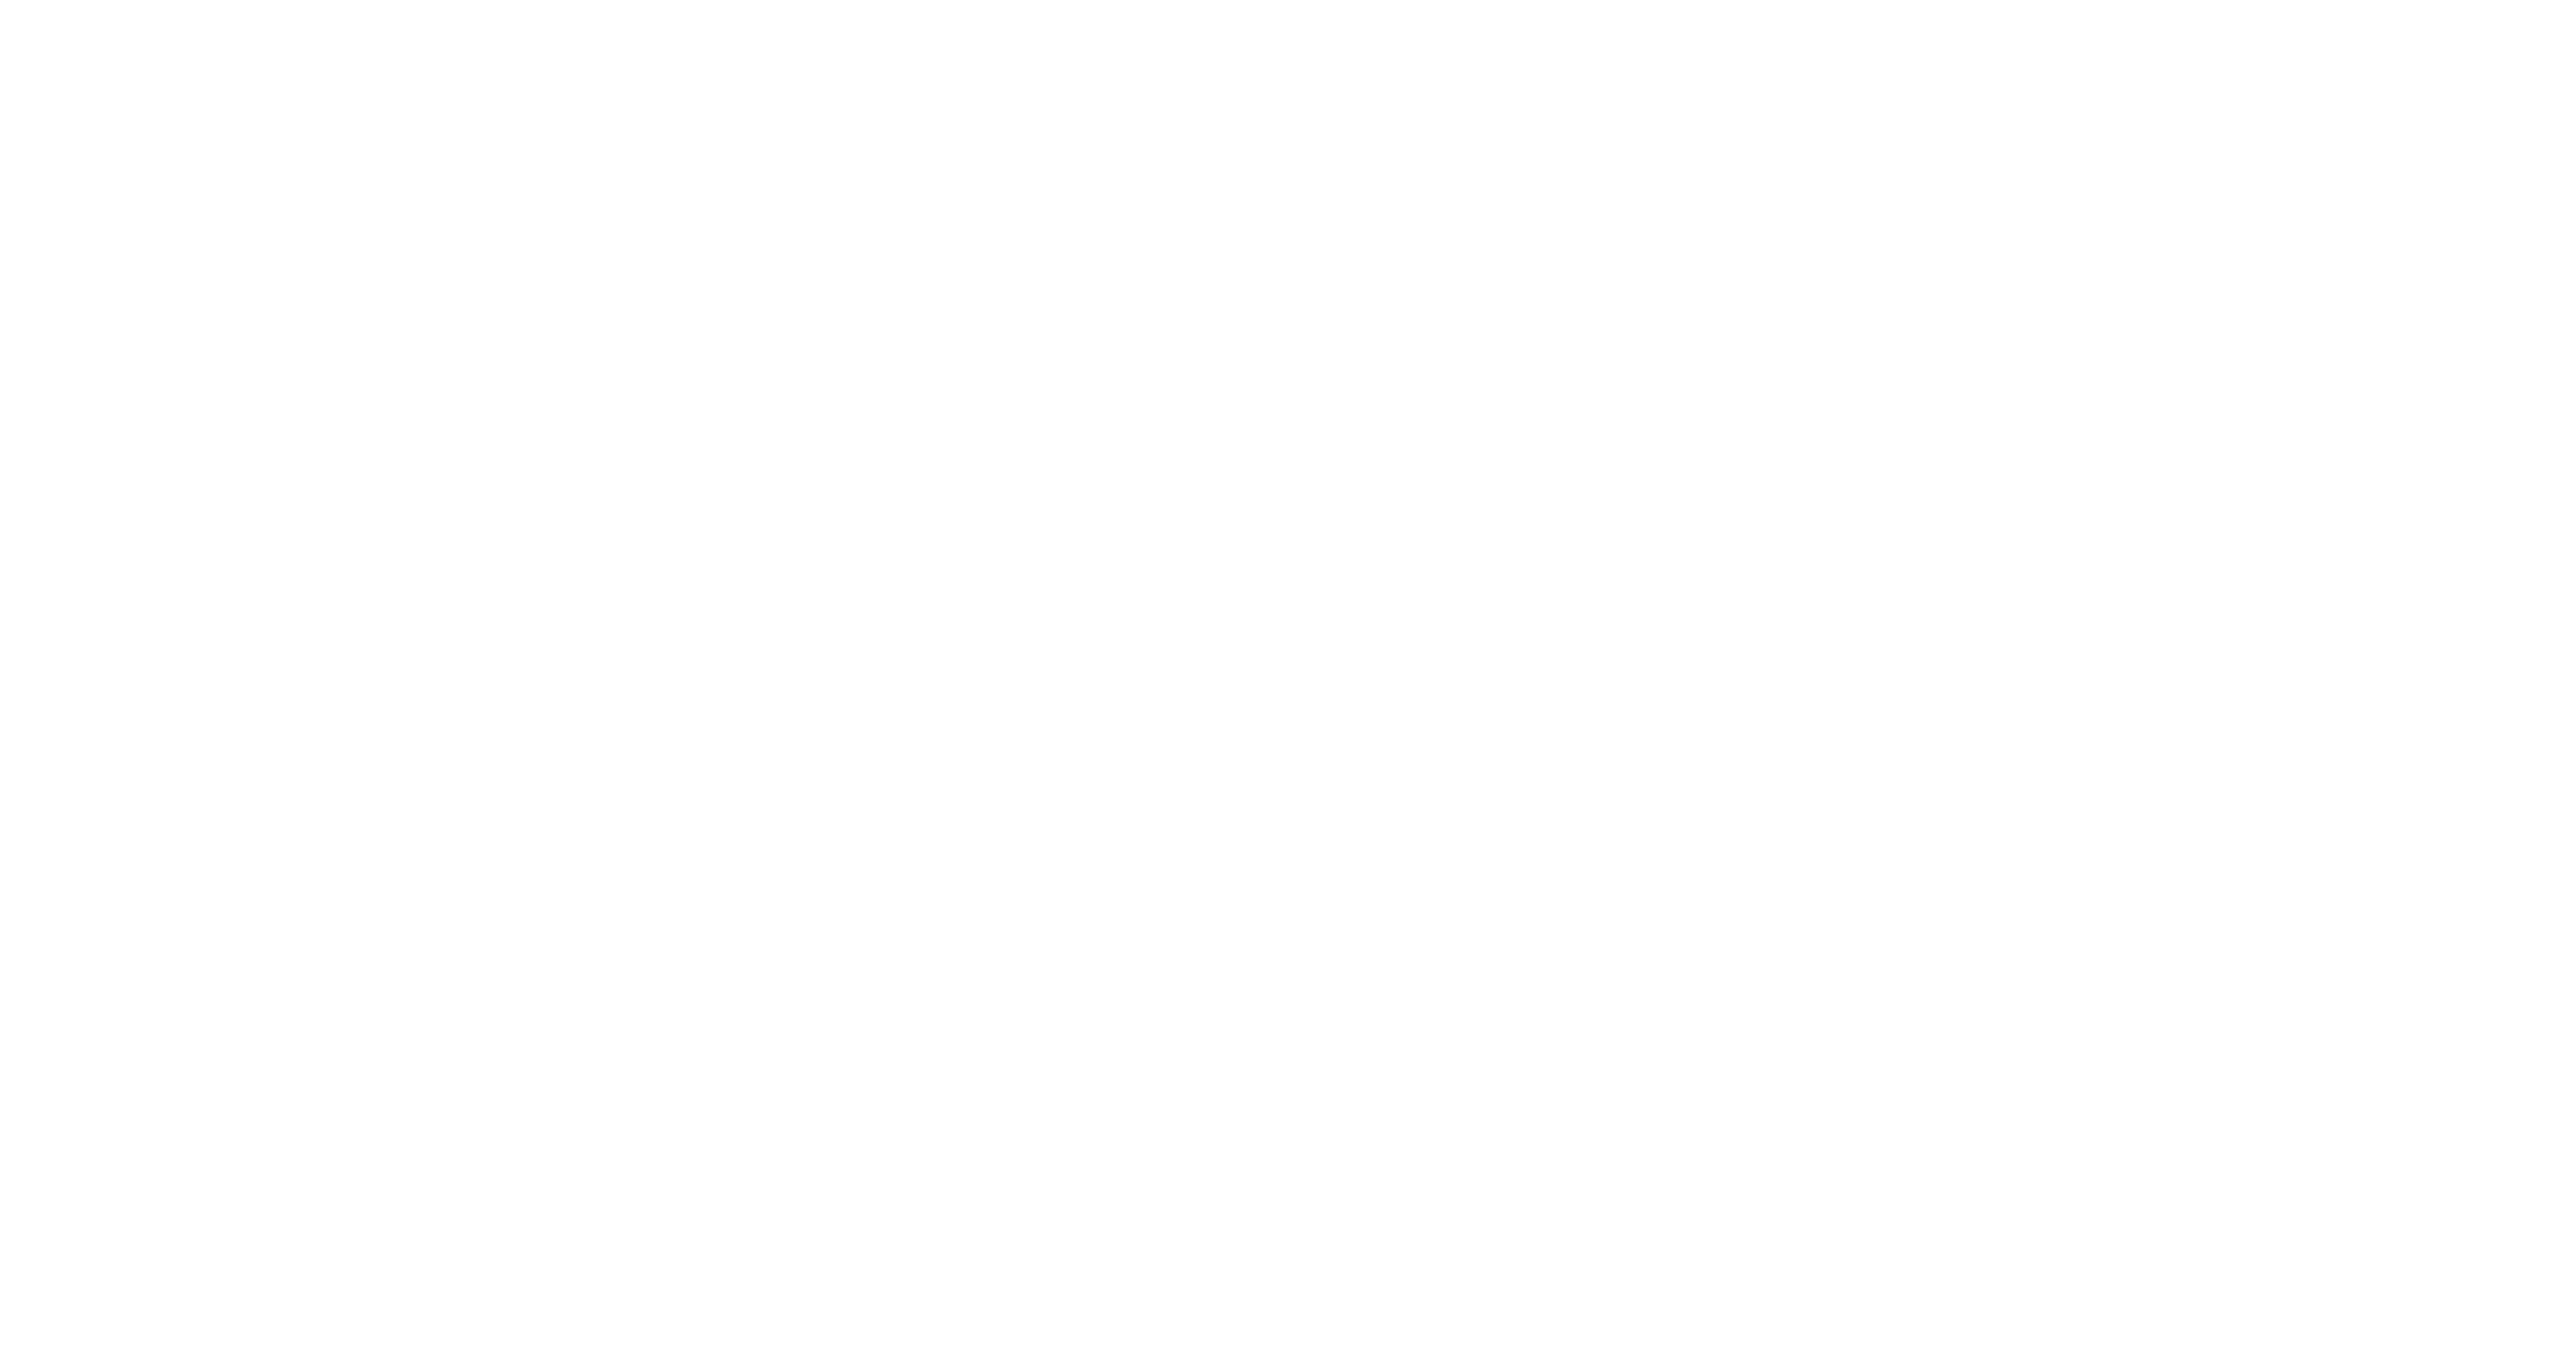 Frames Etc